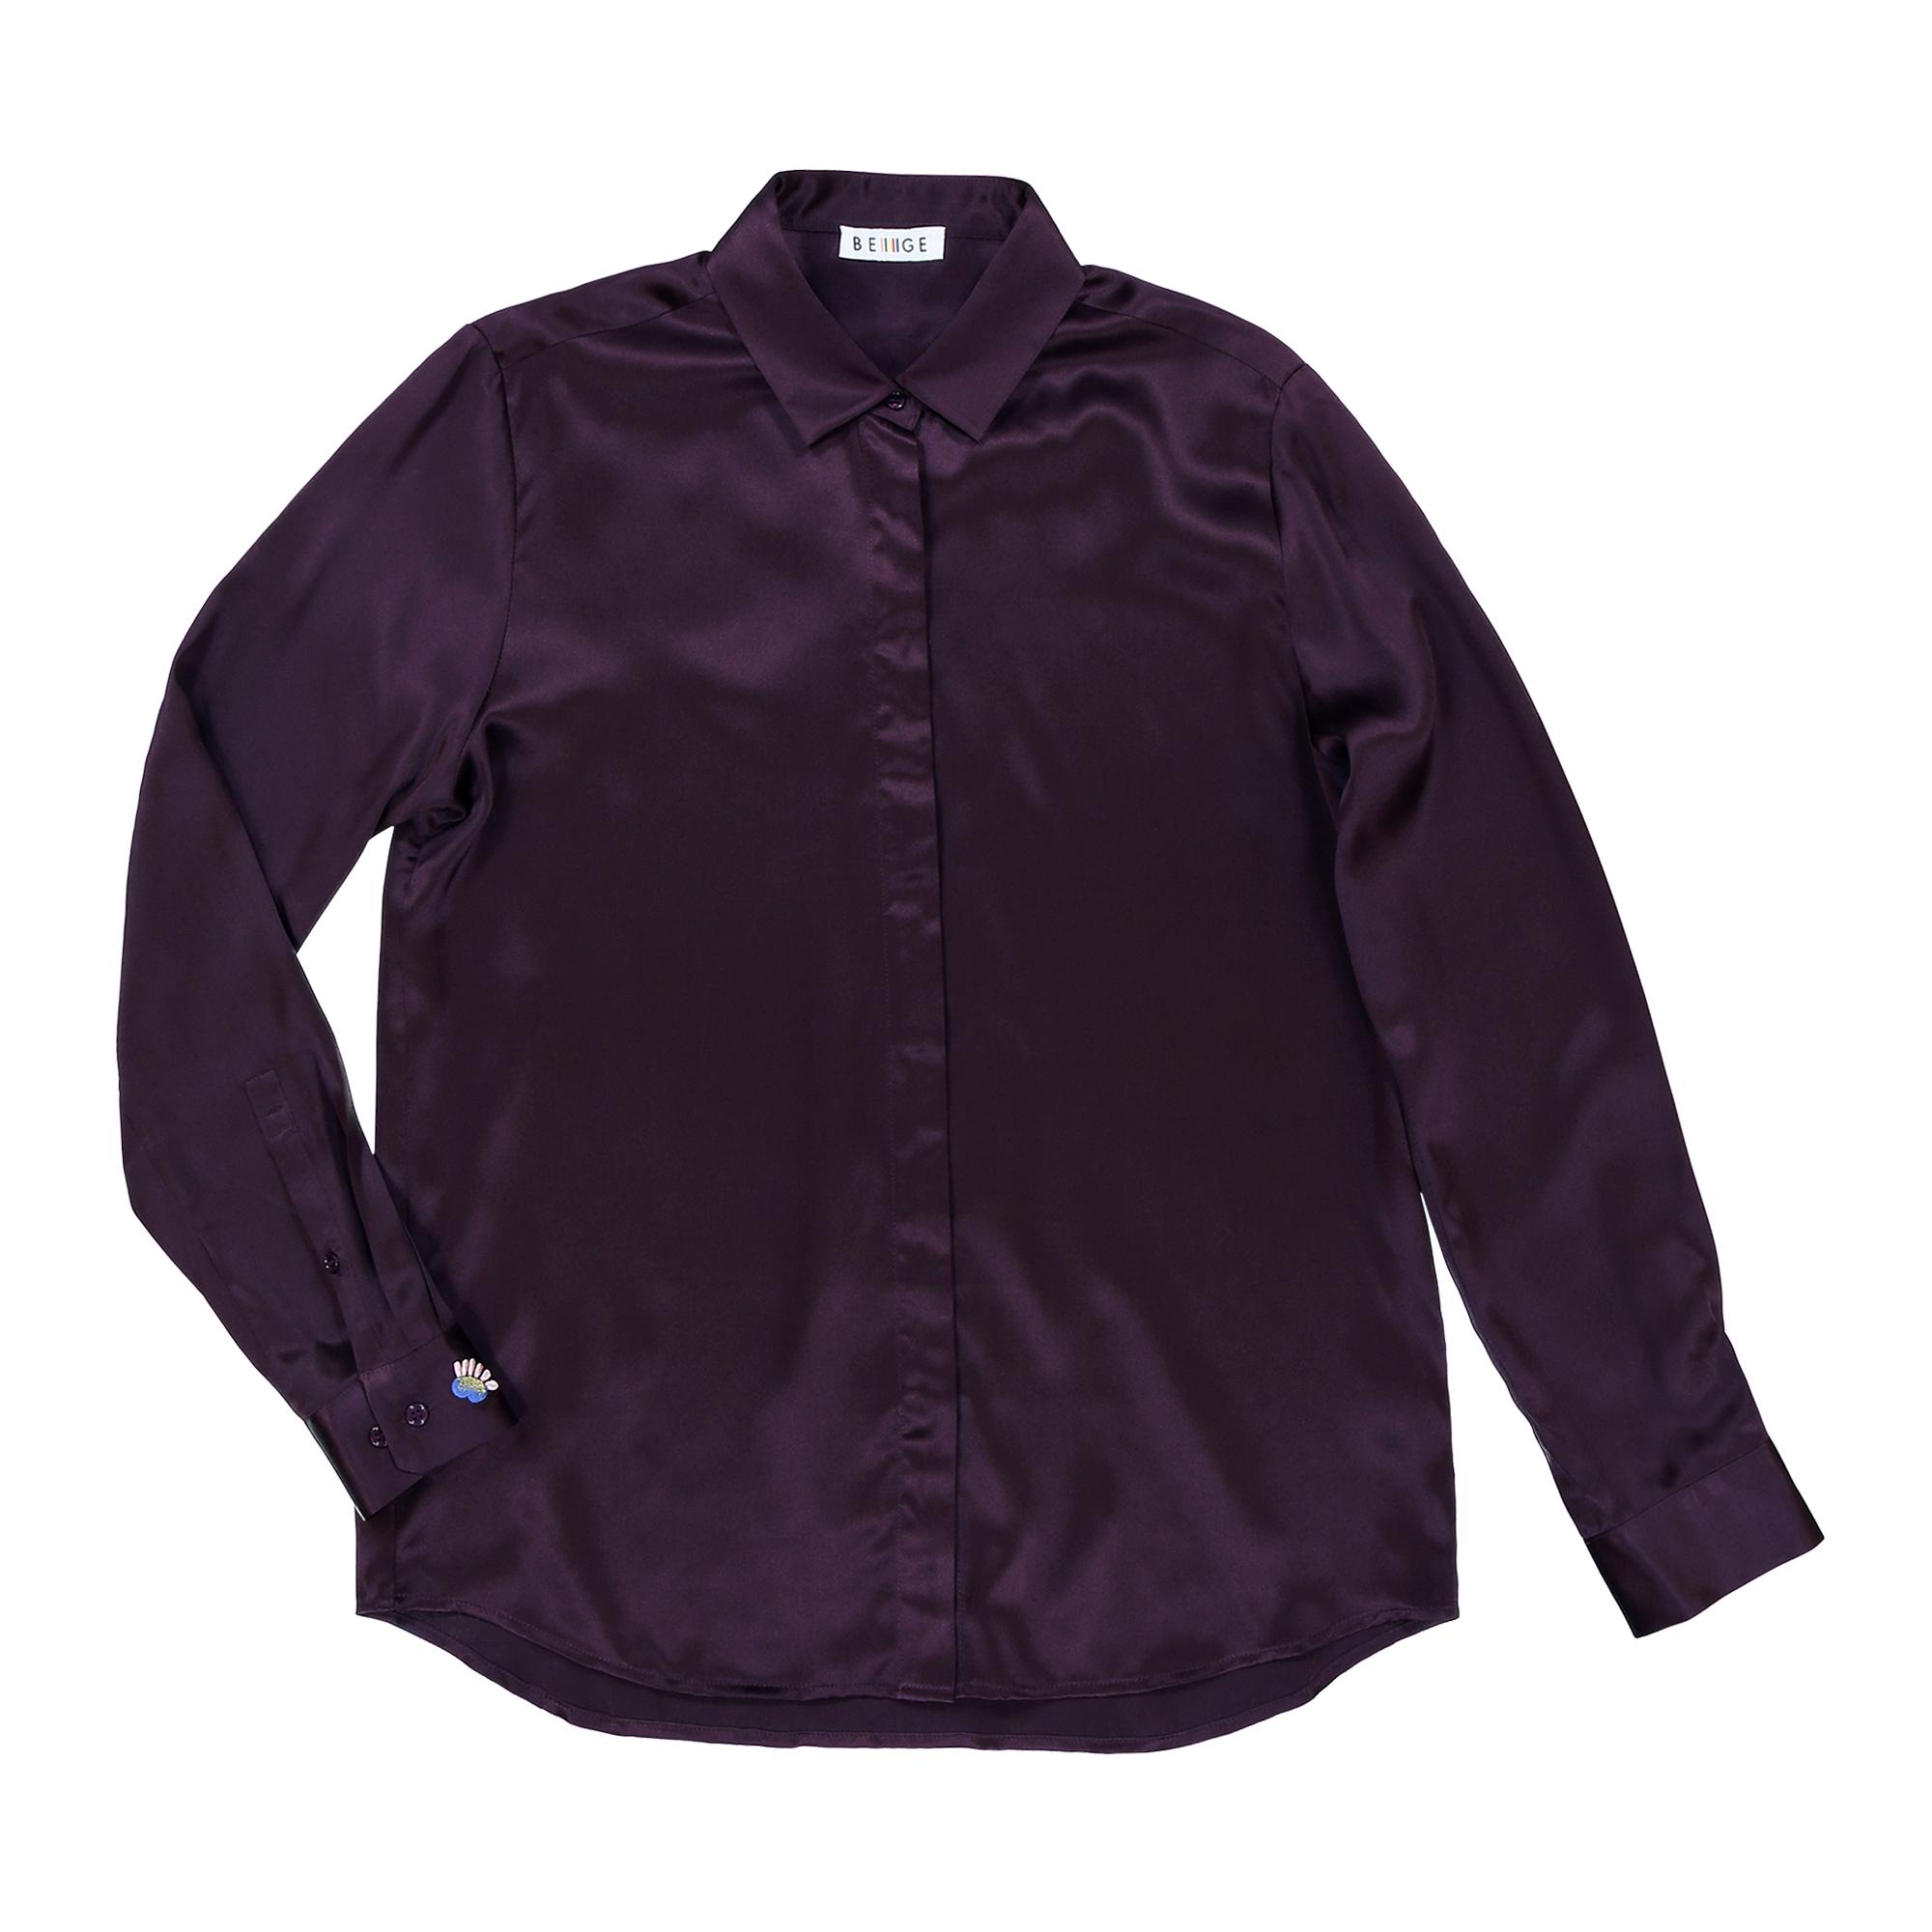 Silk+Shirt_Purple+Rain_2 (1).jpg